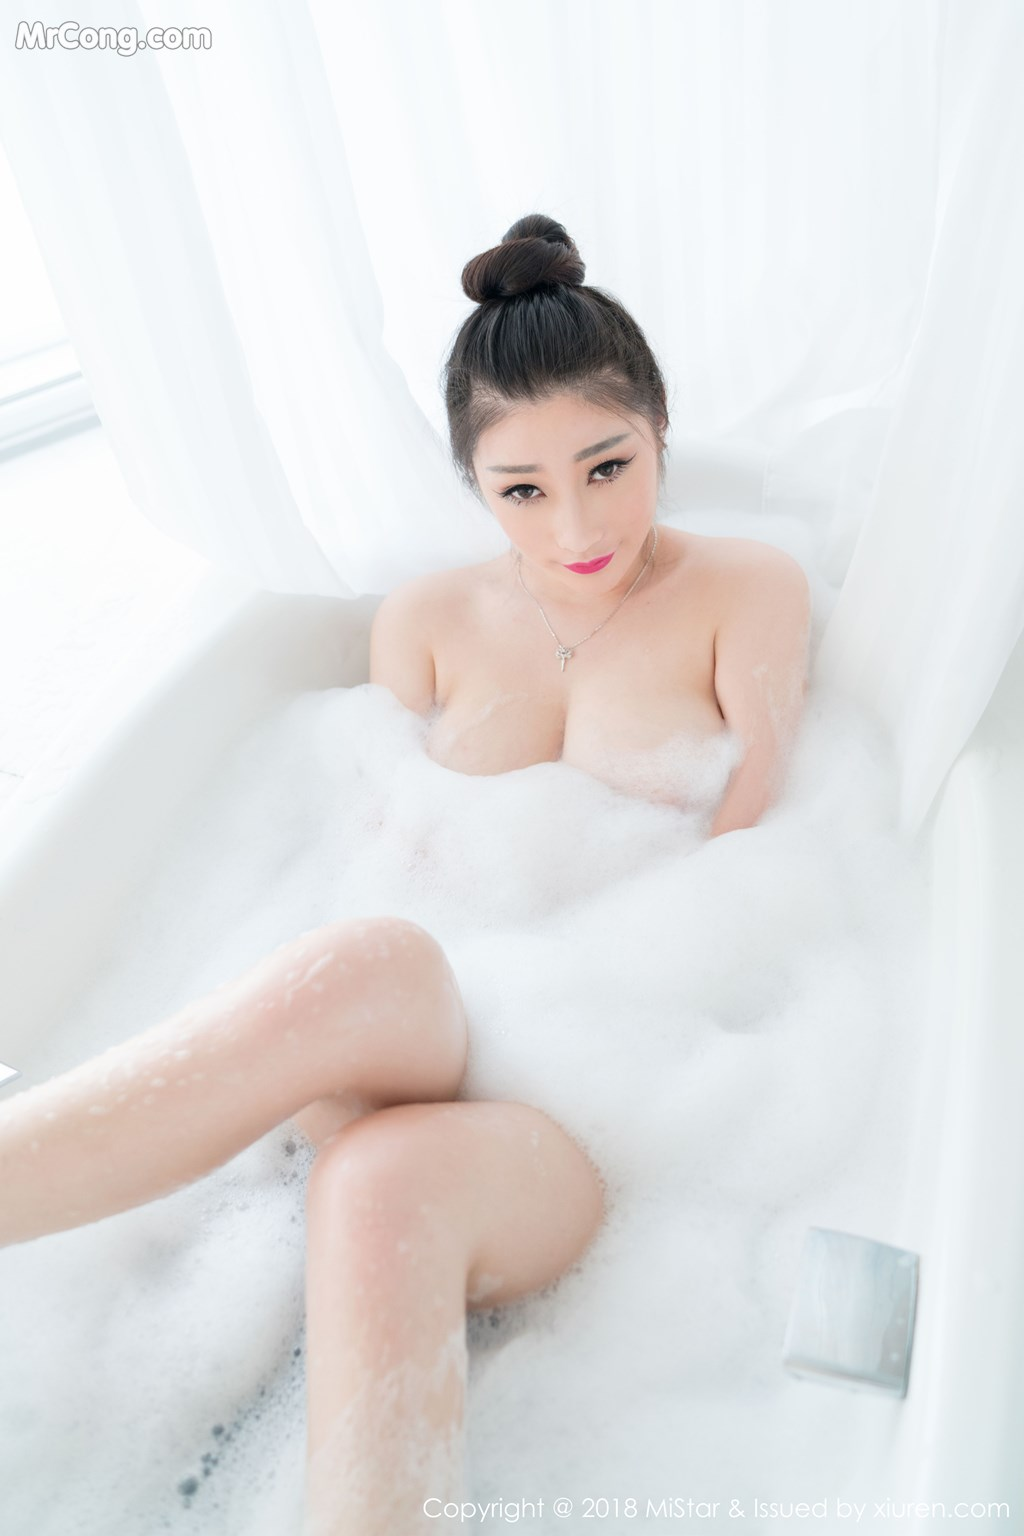 Image MiStar-Vol.244-Daji-Toxic-MrCong.com-004 in post MiStar Vol.244: Người mẫu Daji_Toxic (妲己_Toxic) (43 ảnh)